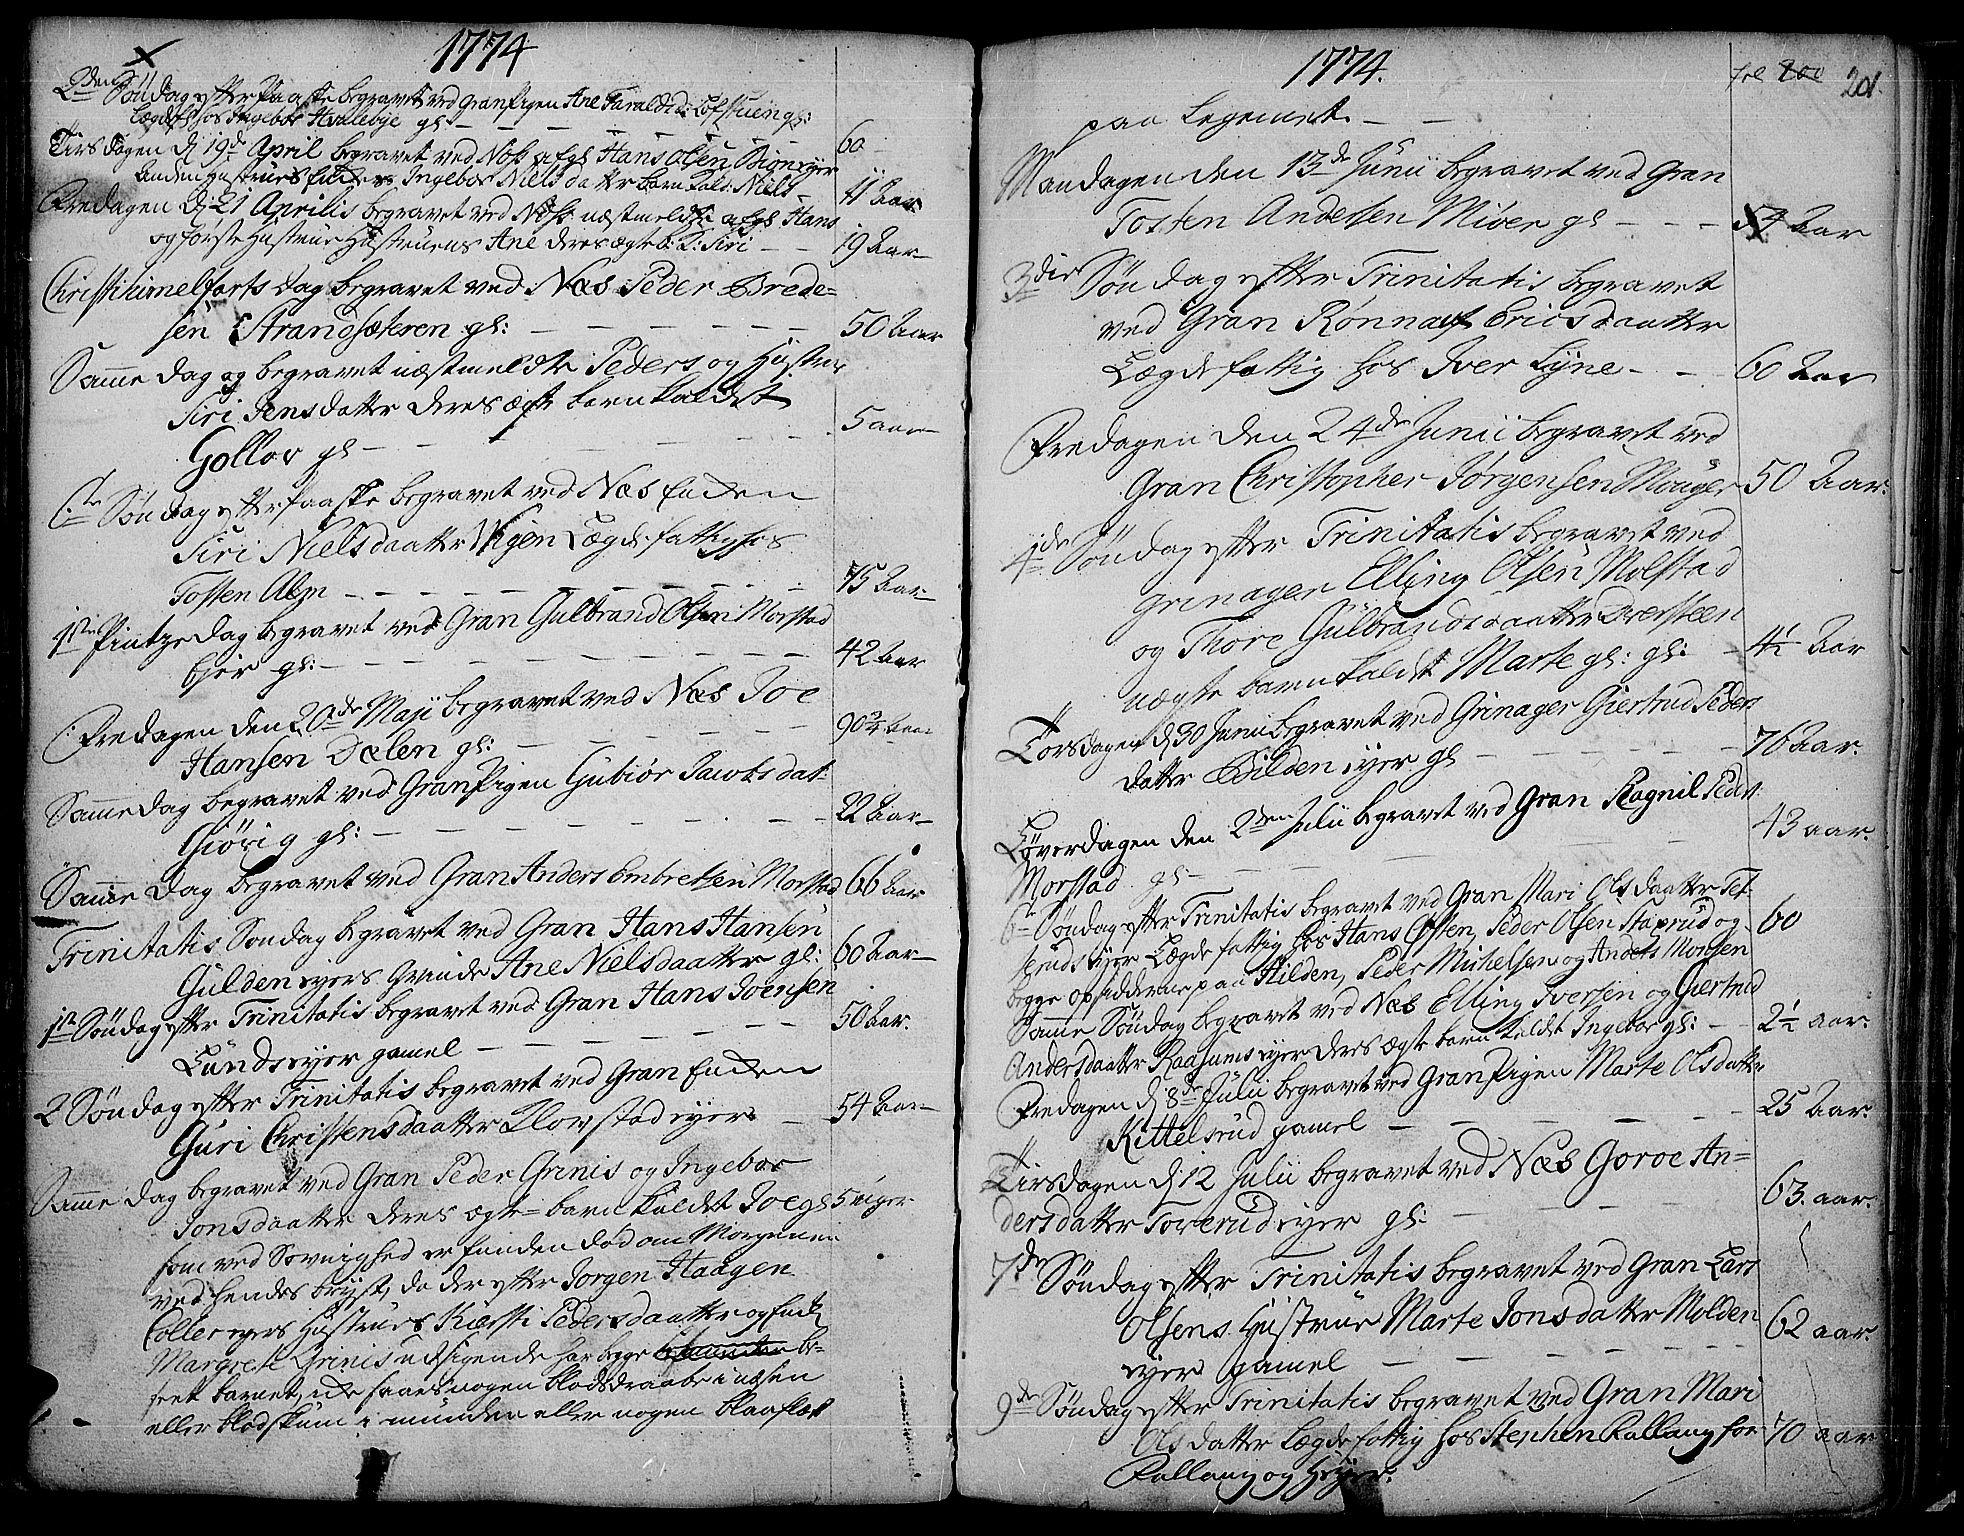 SAH, Gran prestekontor, Parish register (official) no. 4, 1759-1775, p. 201